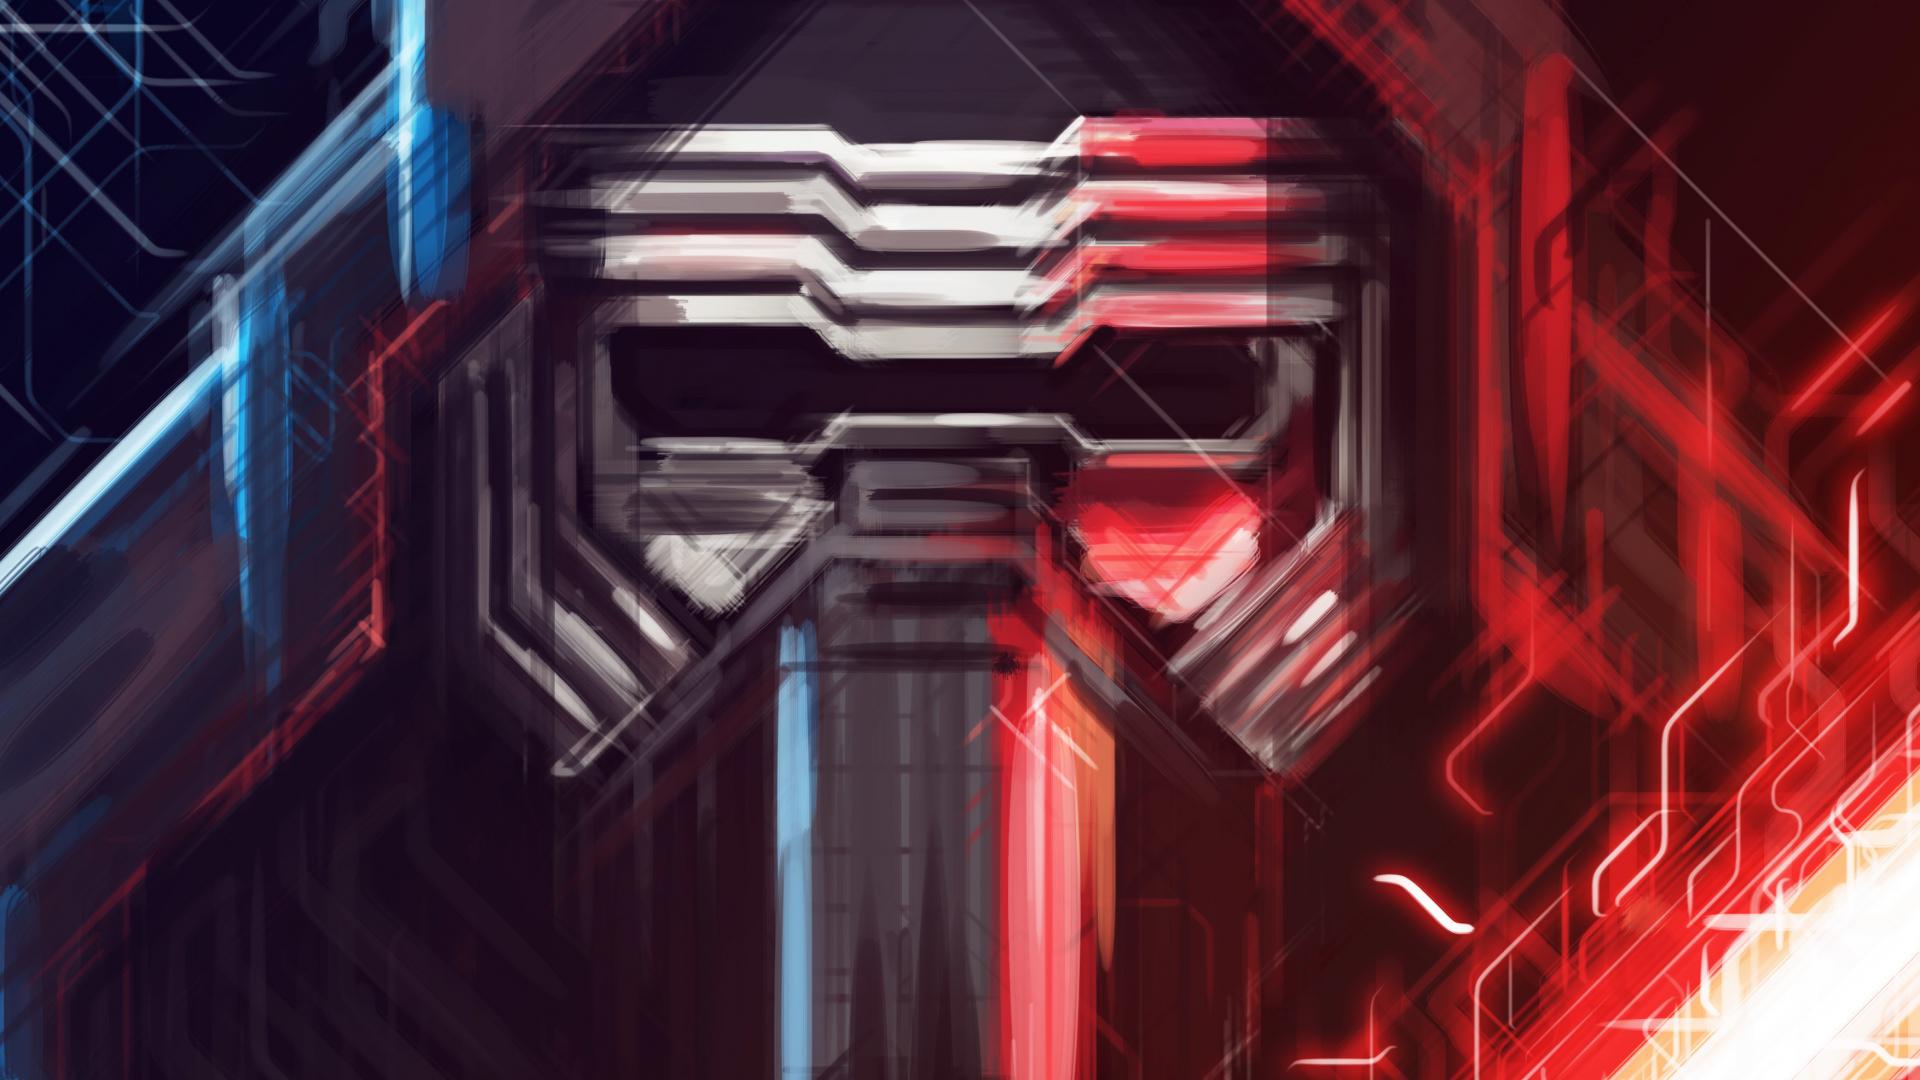 Download 1920x1080 Wallpaper Kylo Ren Star Wars Villain